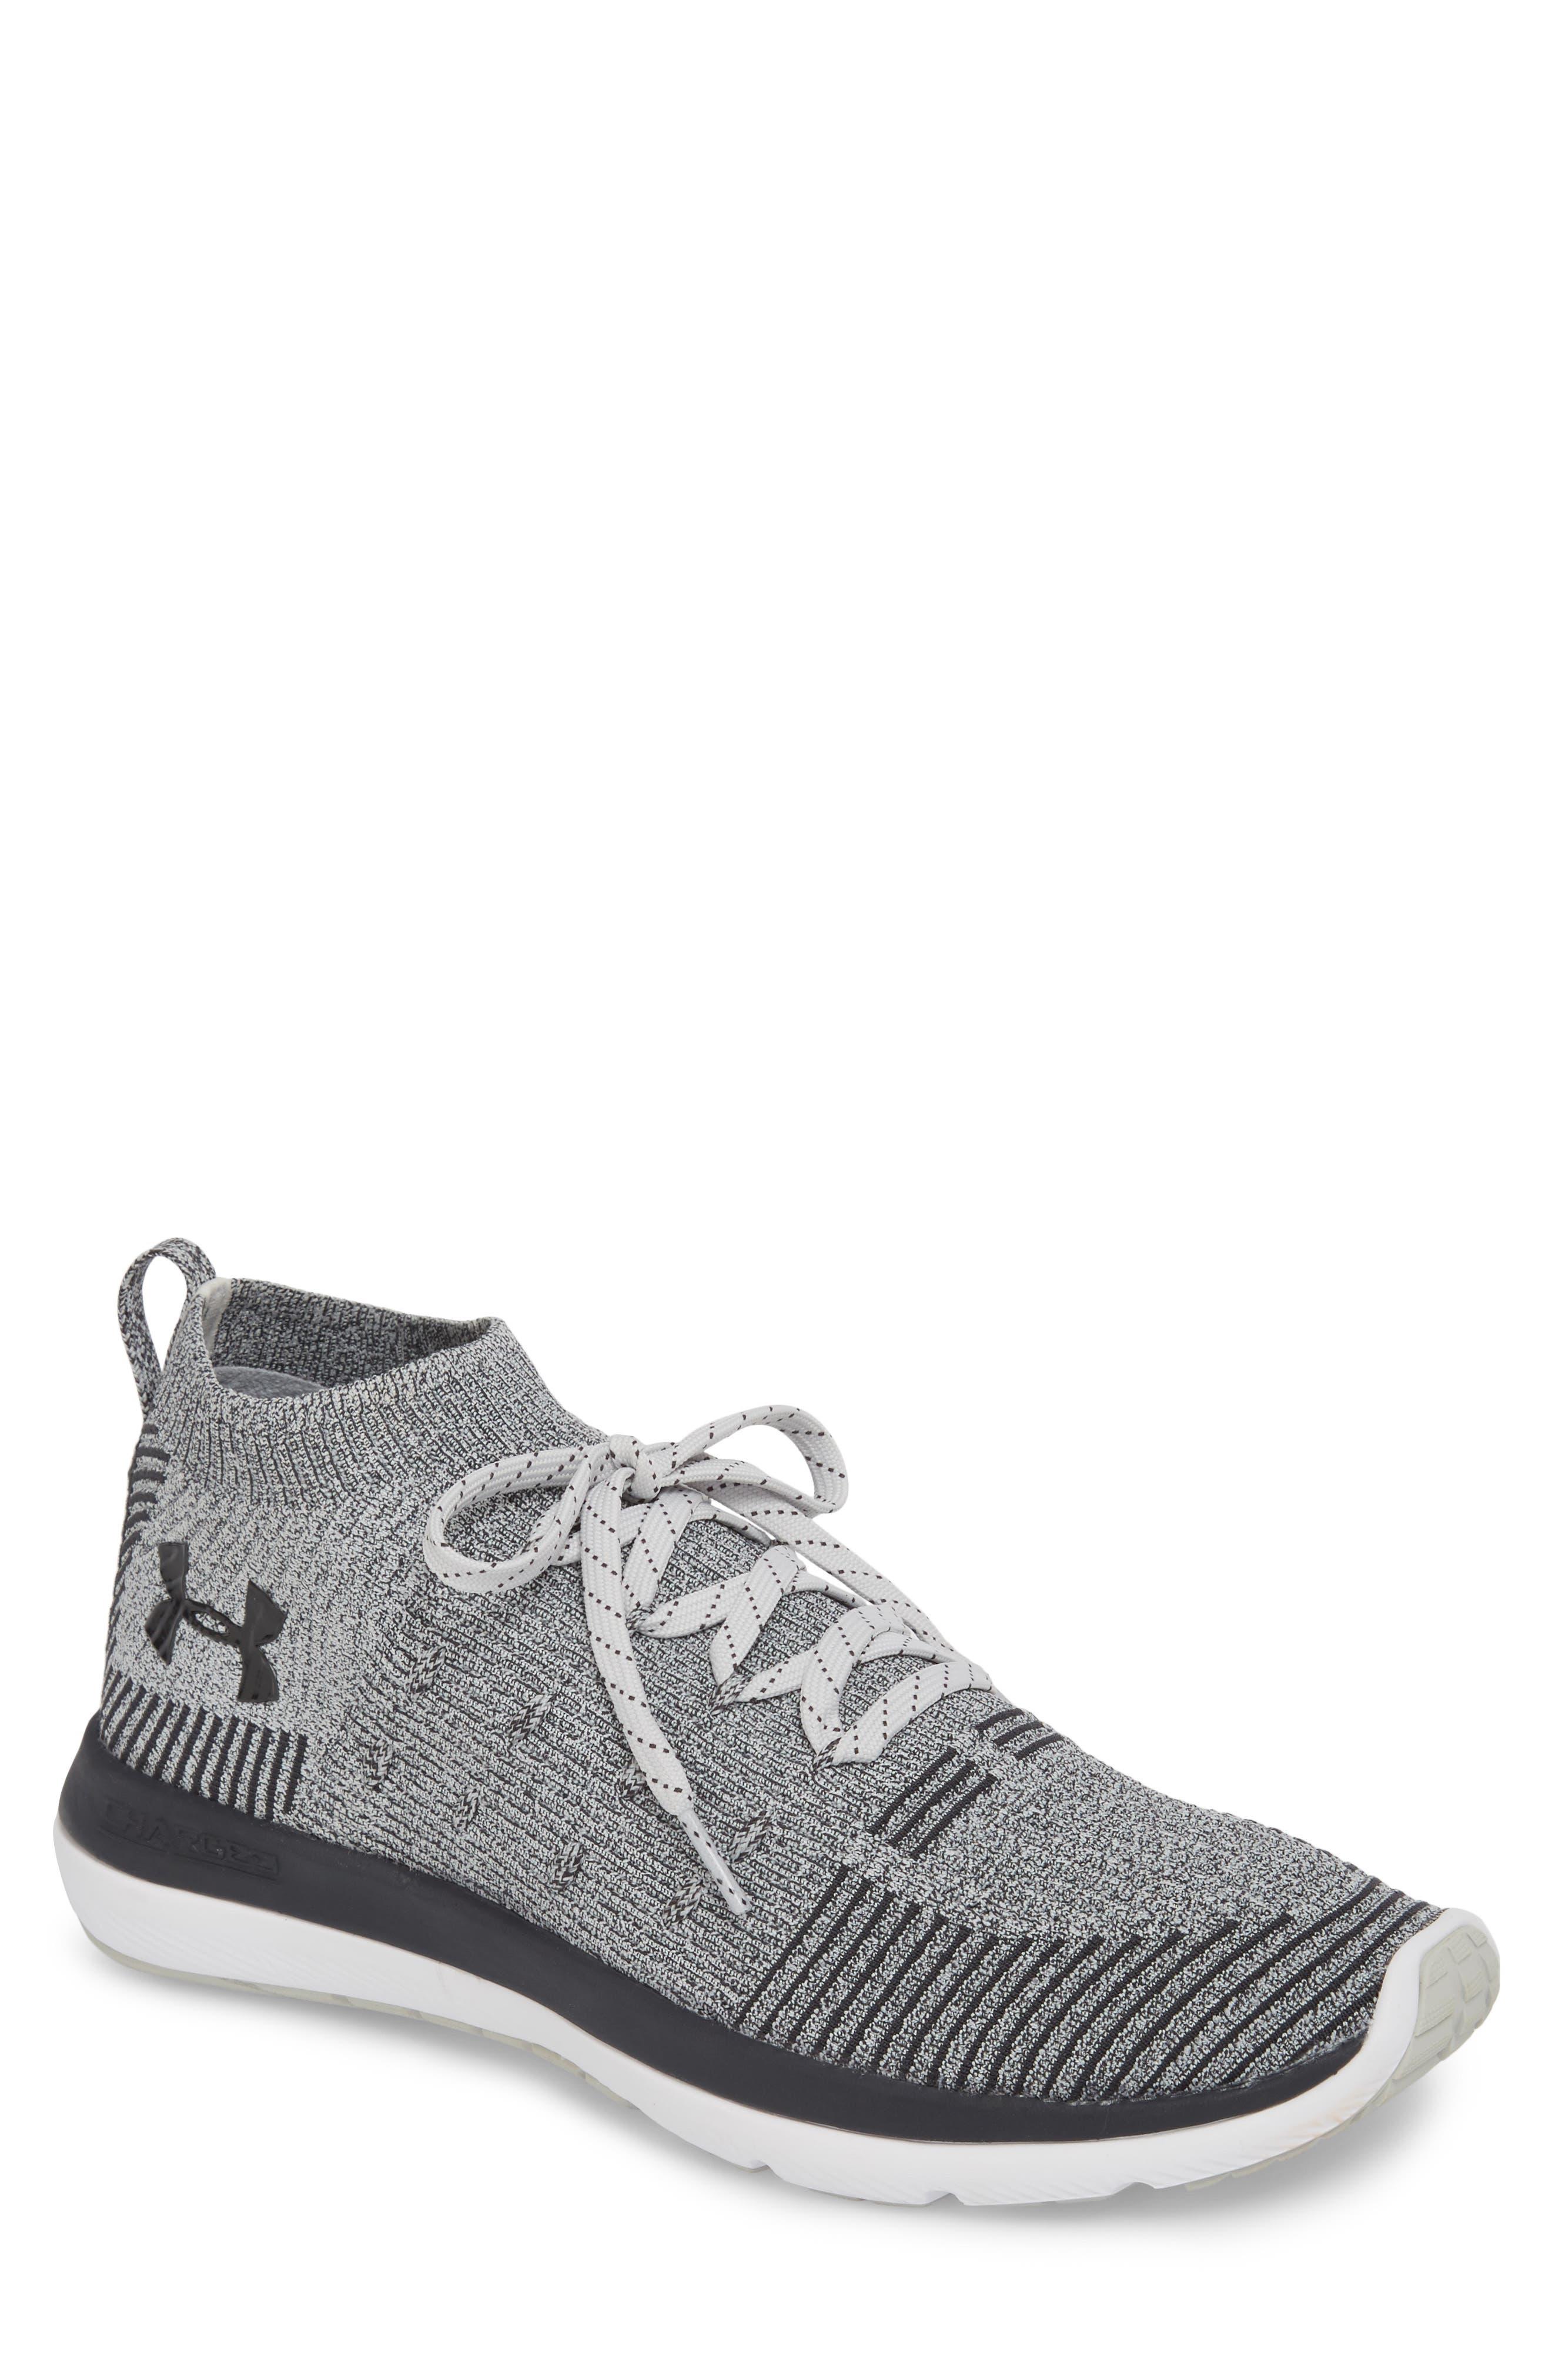 Slingflex Rise Sneaker,                             Main thumbnail 1, color,                             ELEMENTAL/ ANTHRACITE